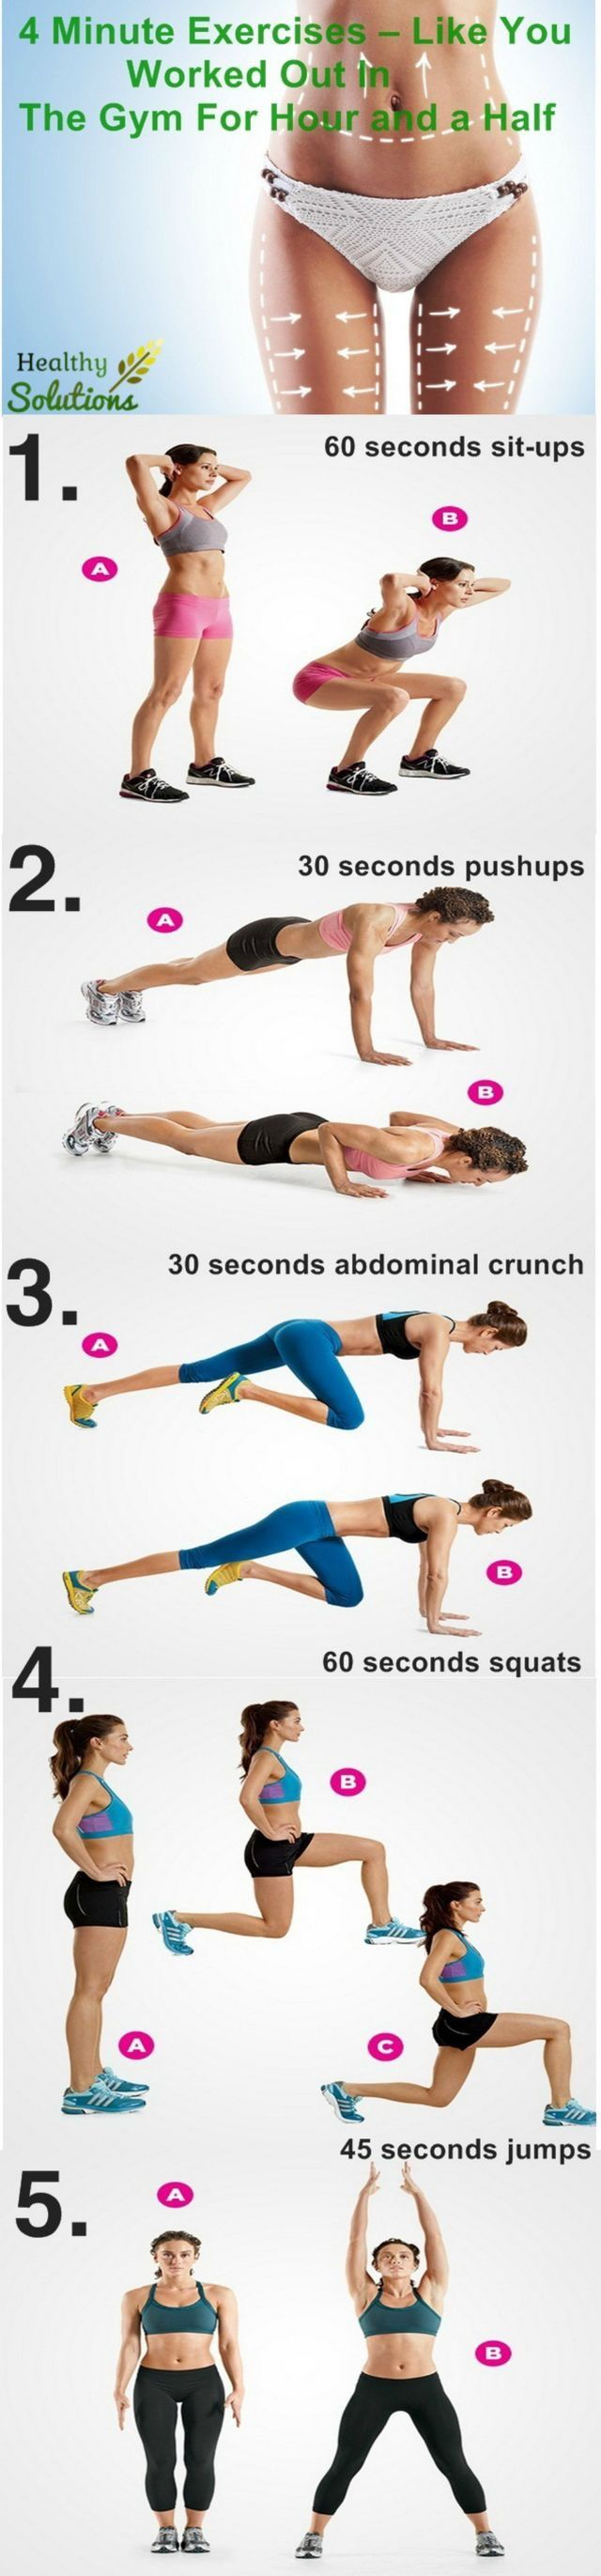 fitness, exersice program, workout routine, workout program, workout abs, workout at home workout anytime, workout arms, workout ankle strap,workout board, workout belt, workouts meme